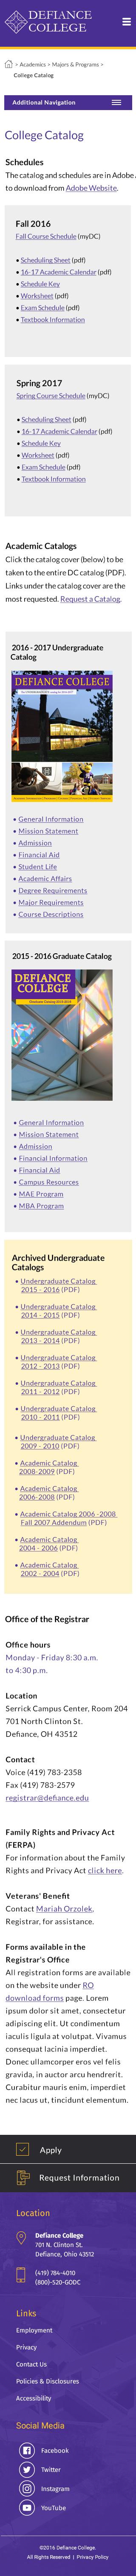 defiancecollege-collegecatalog-tier-4-320-design2a